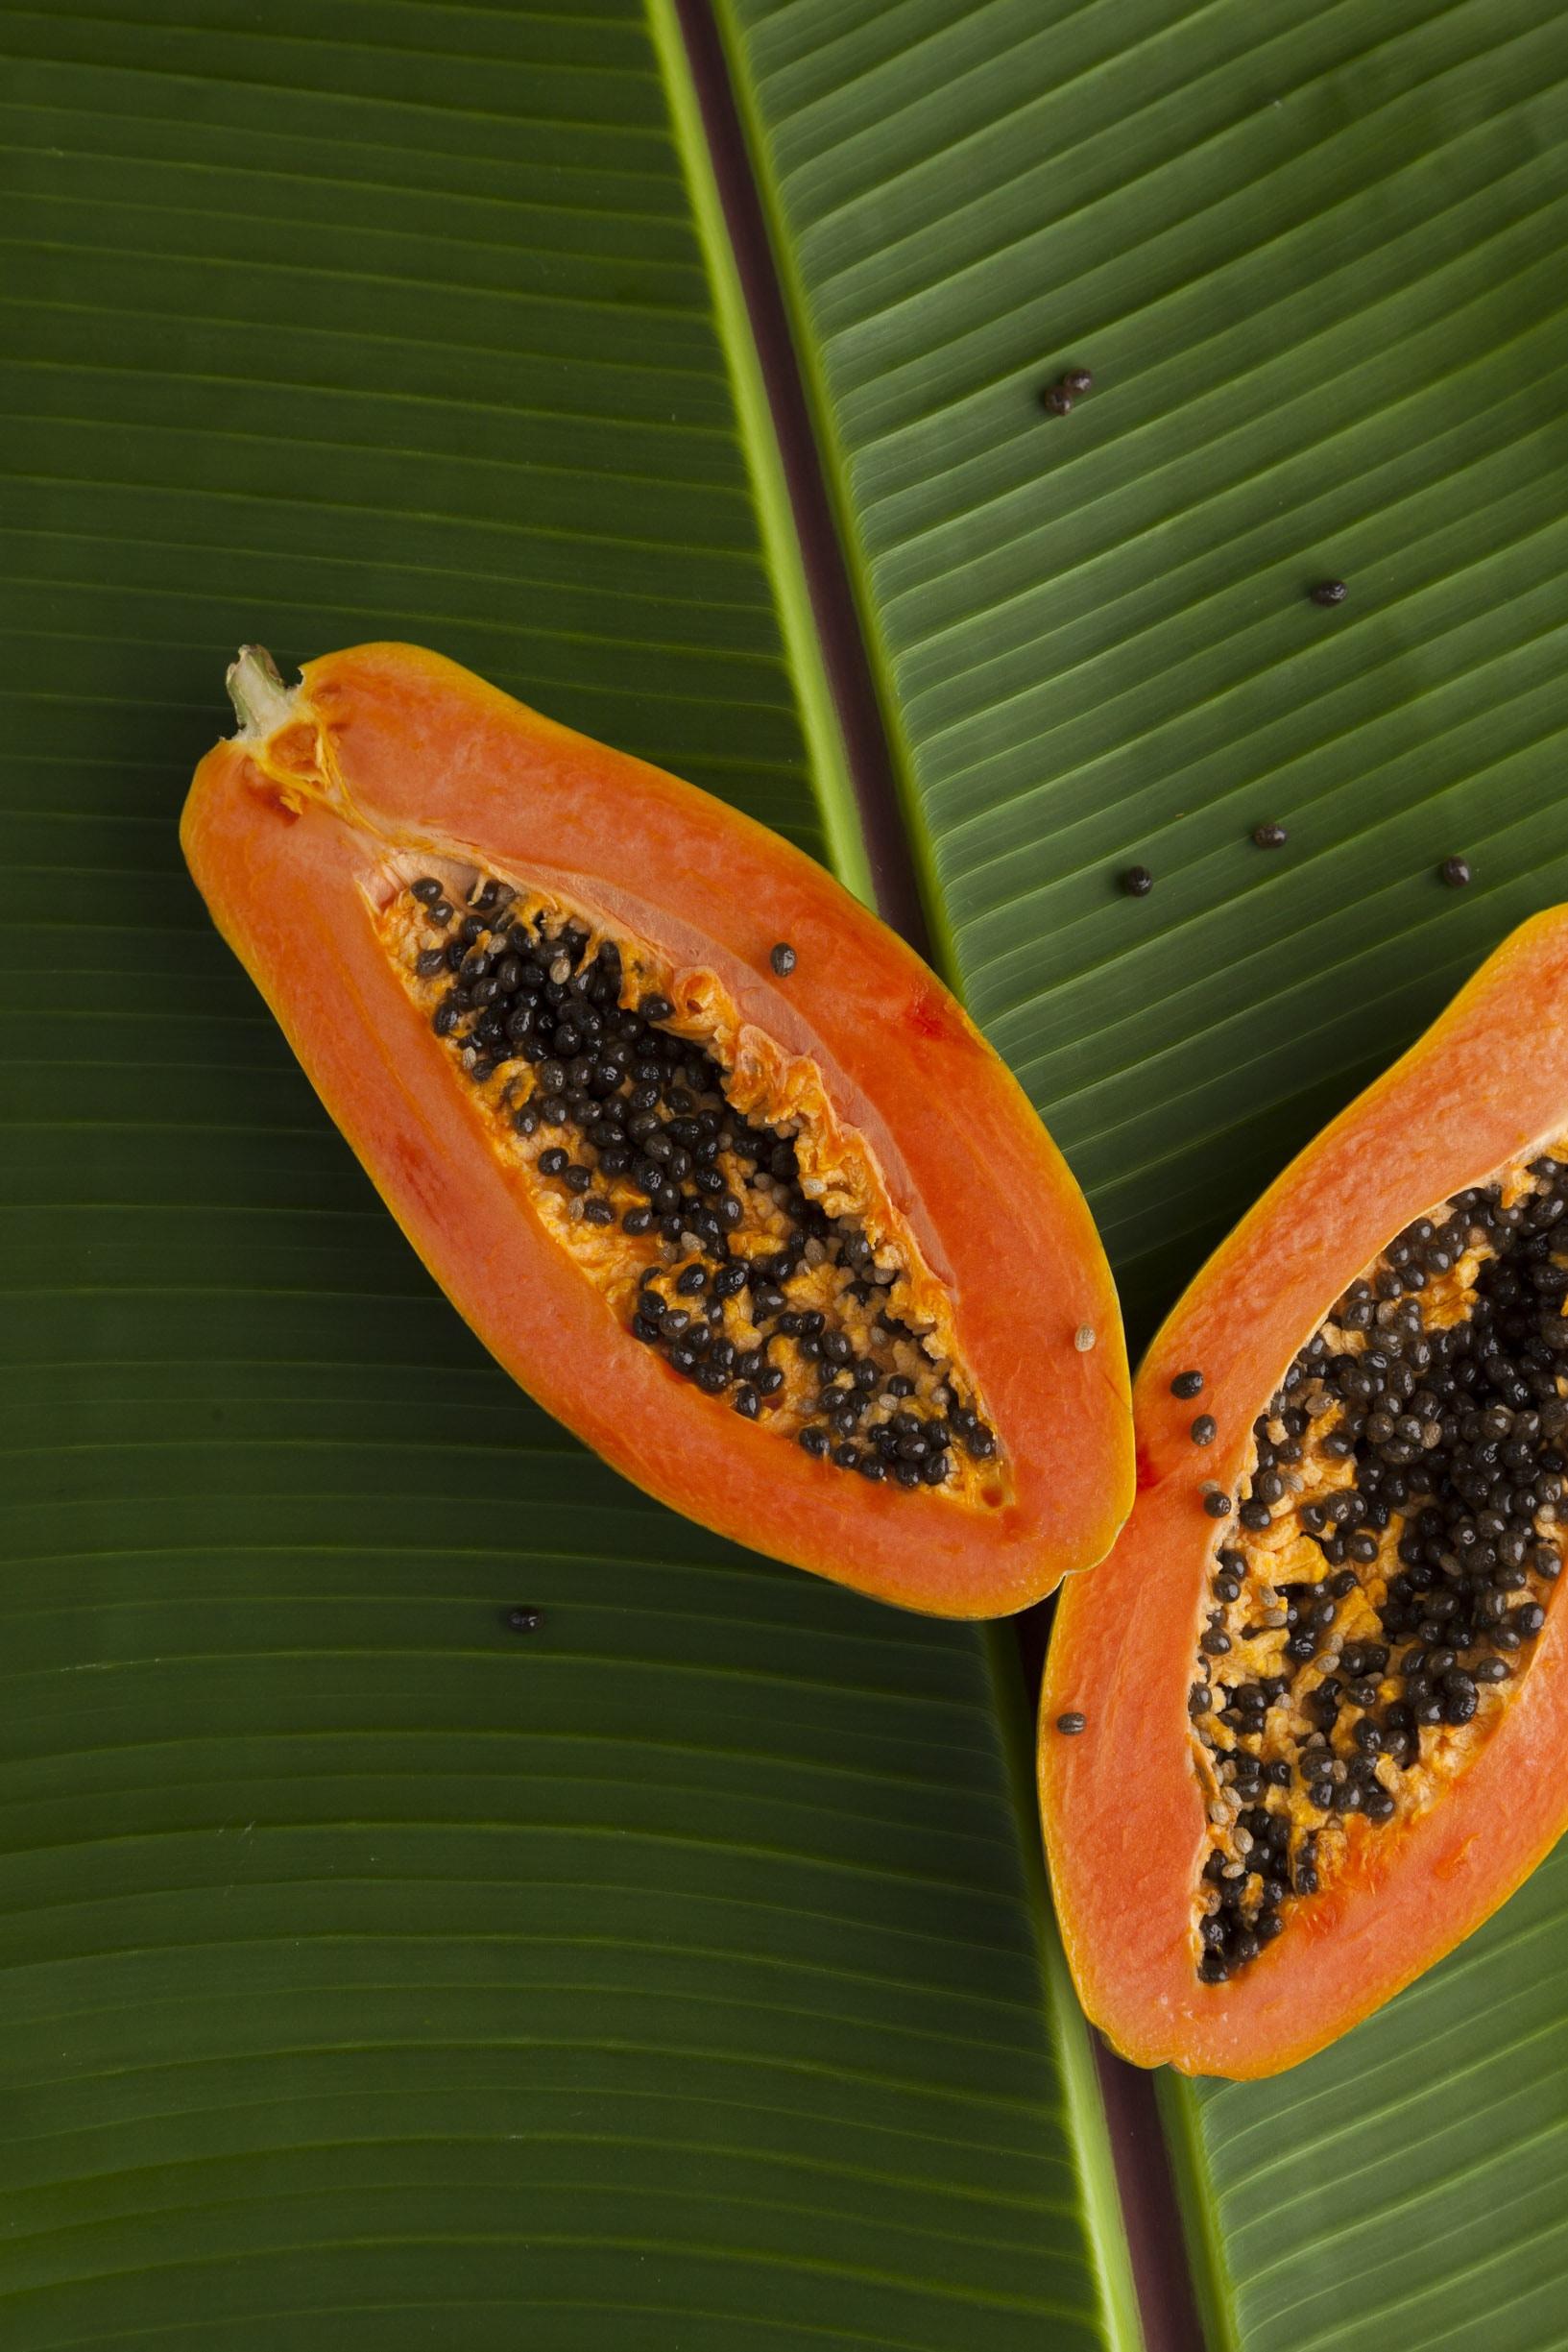 sliced papaya on green banana leaf